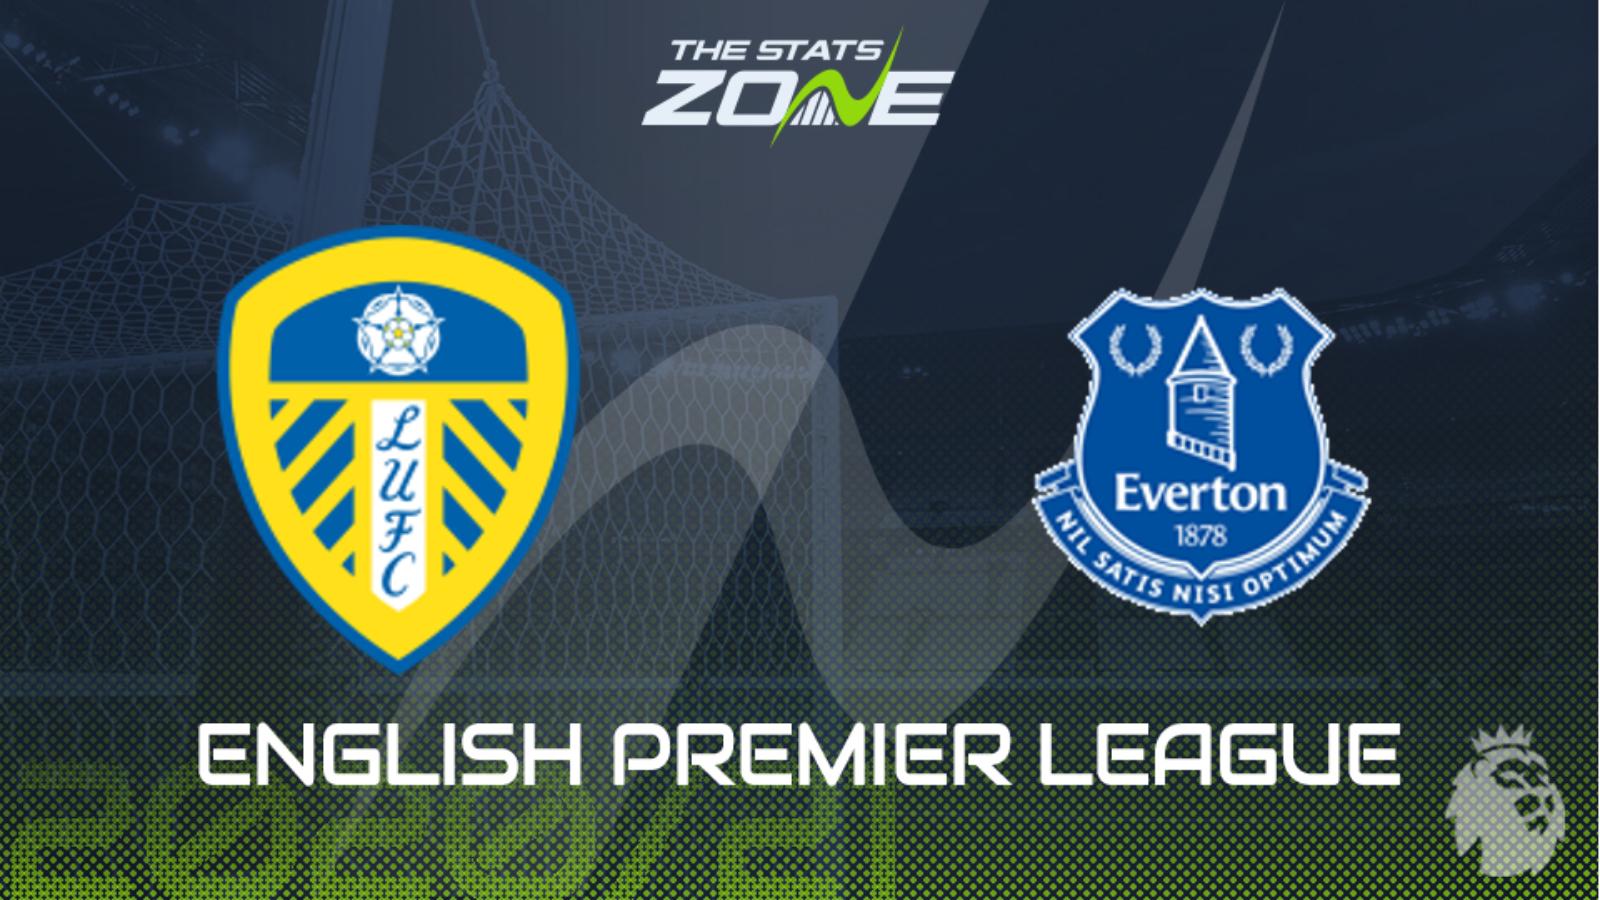 Leeds United vs Everton Highlights 21 August 2021